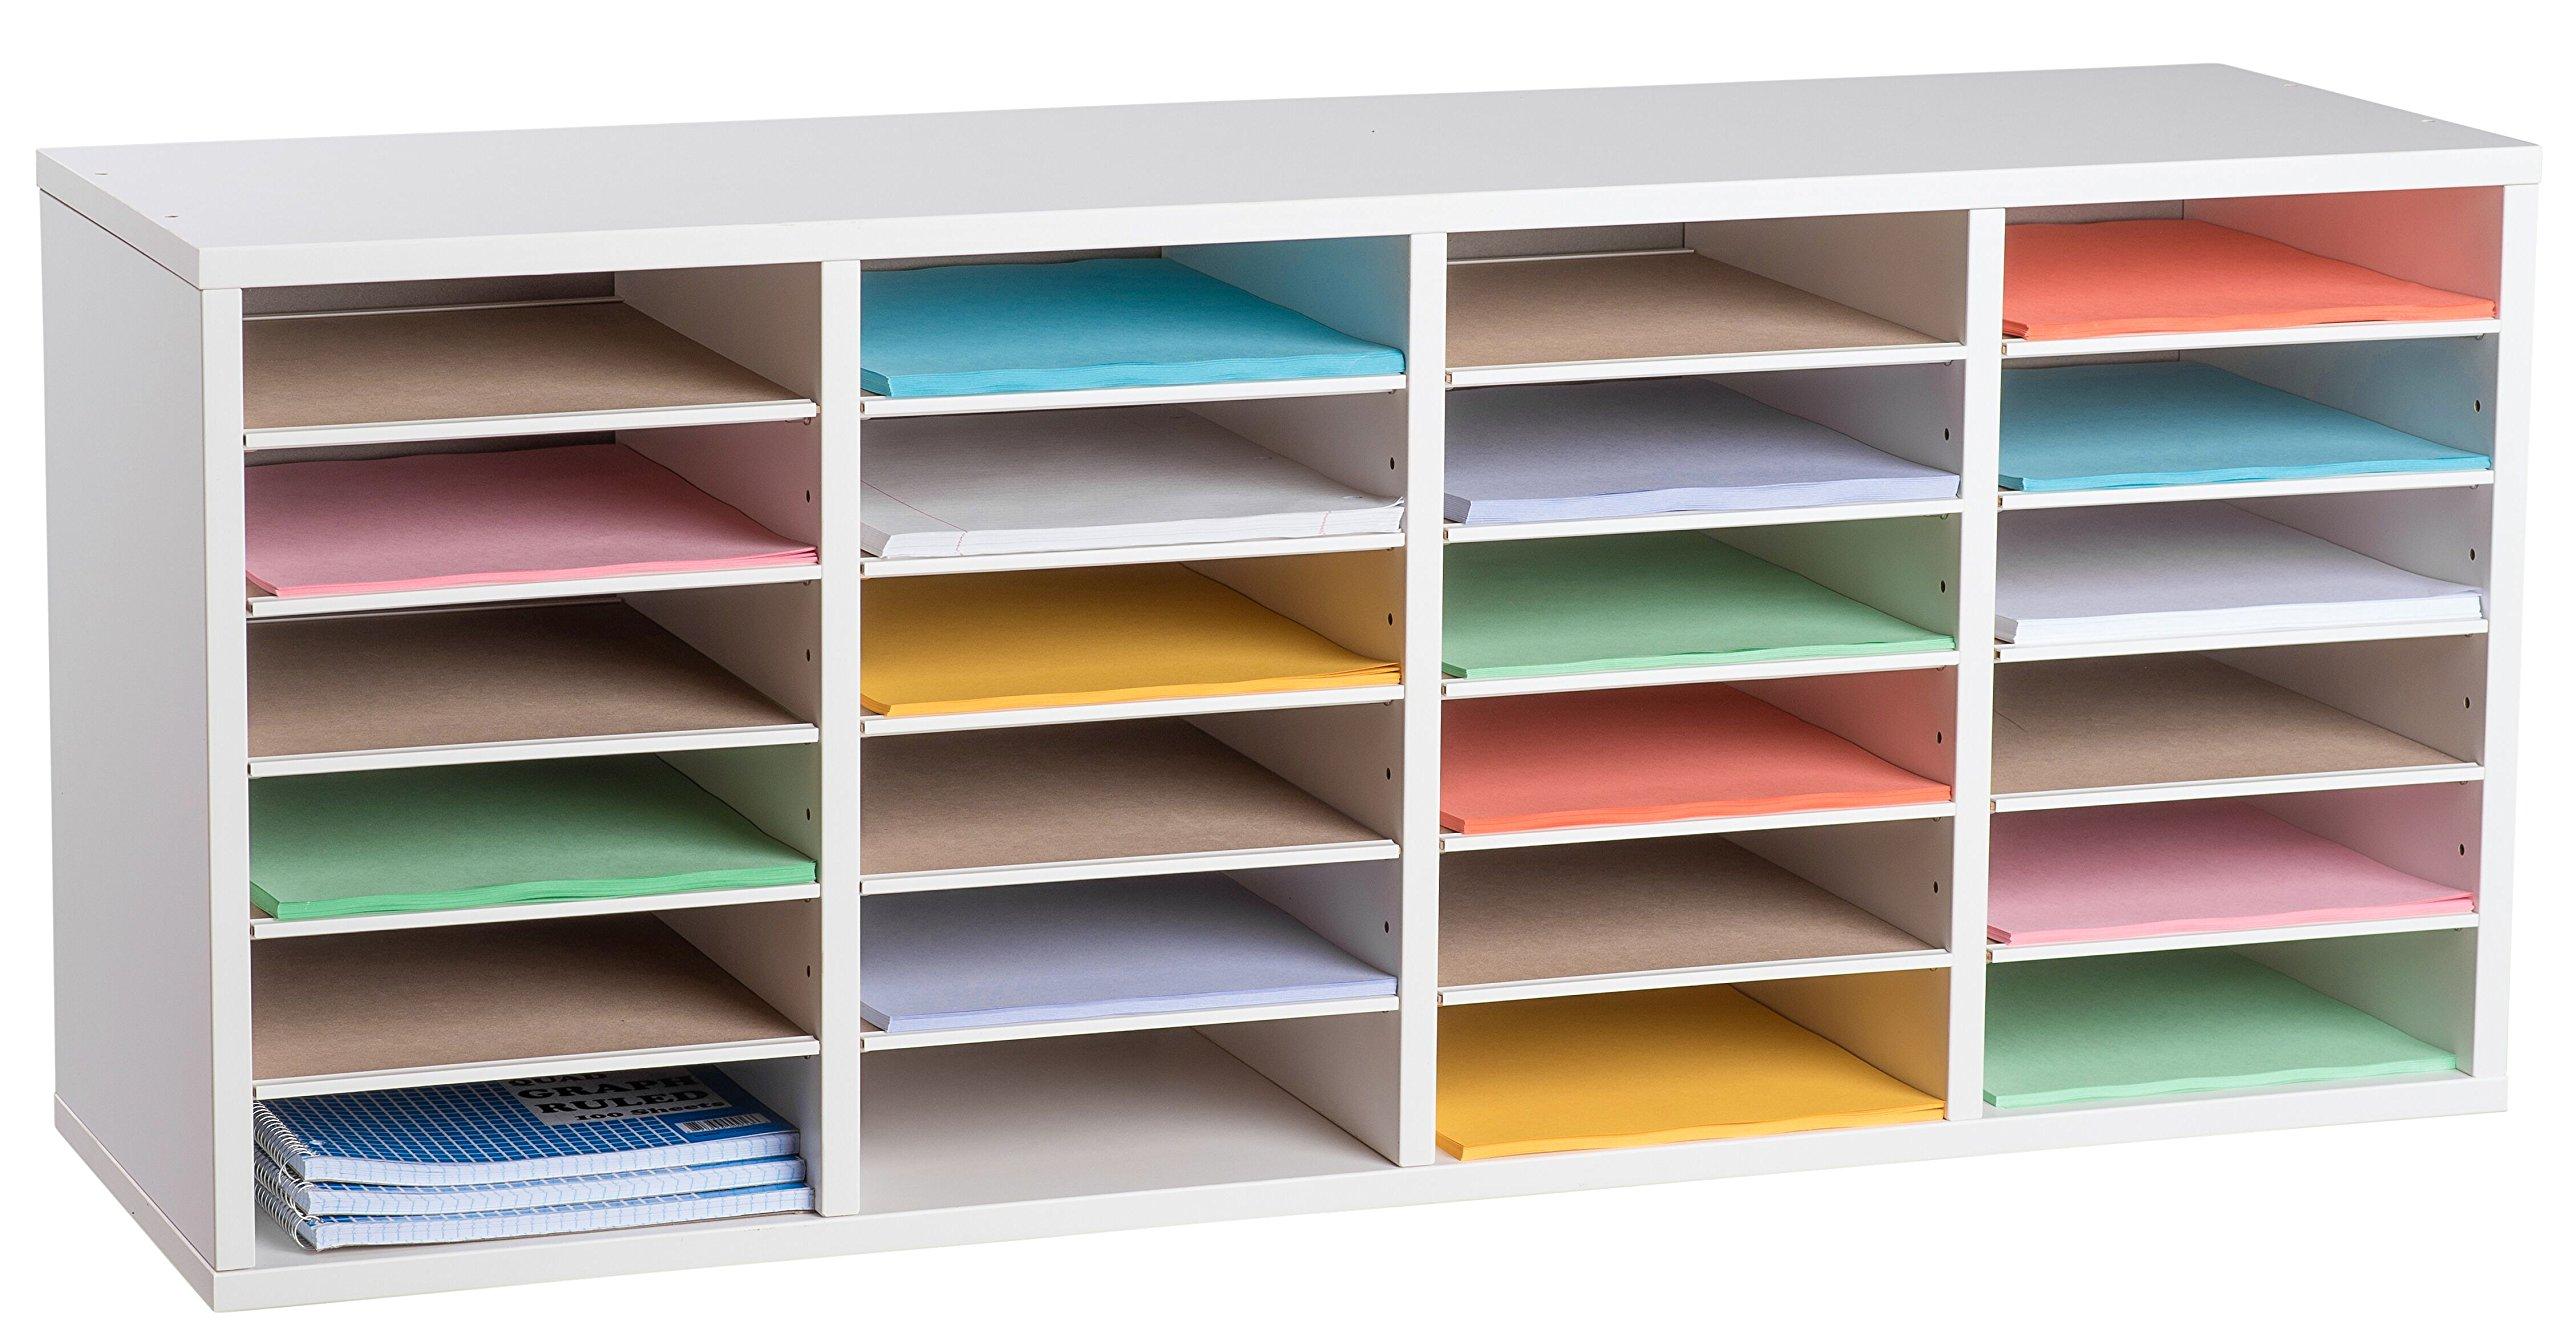 AdirOffice Wood Adjustable Literature Organizer (24 Compartment, White)